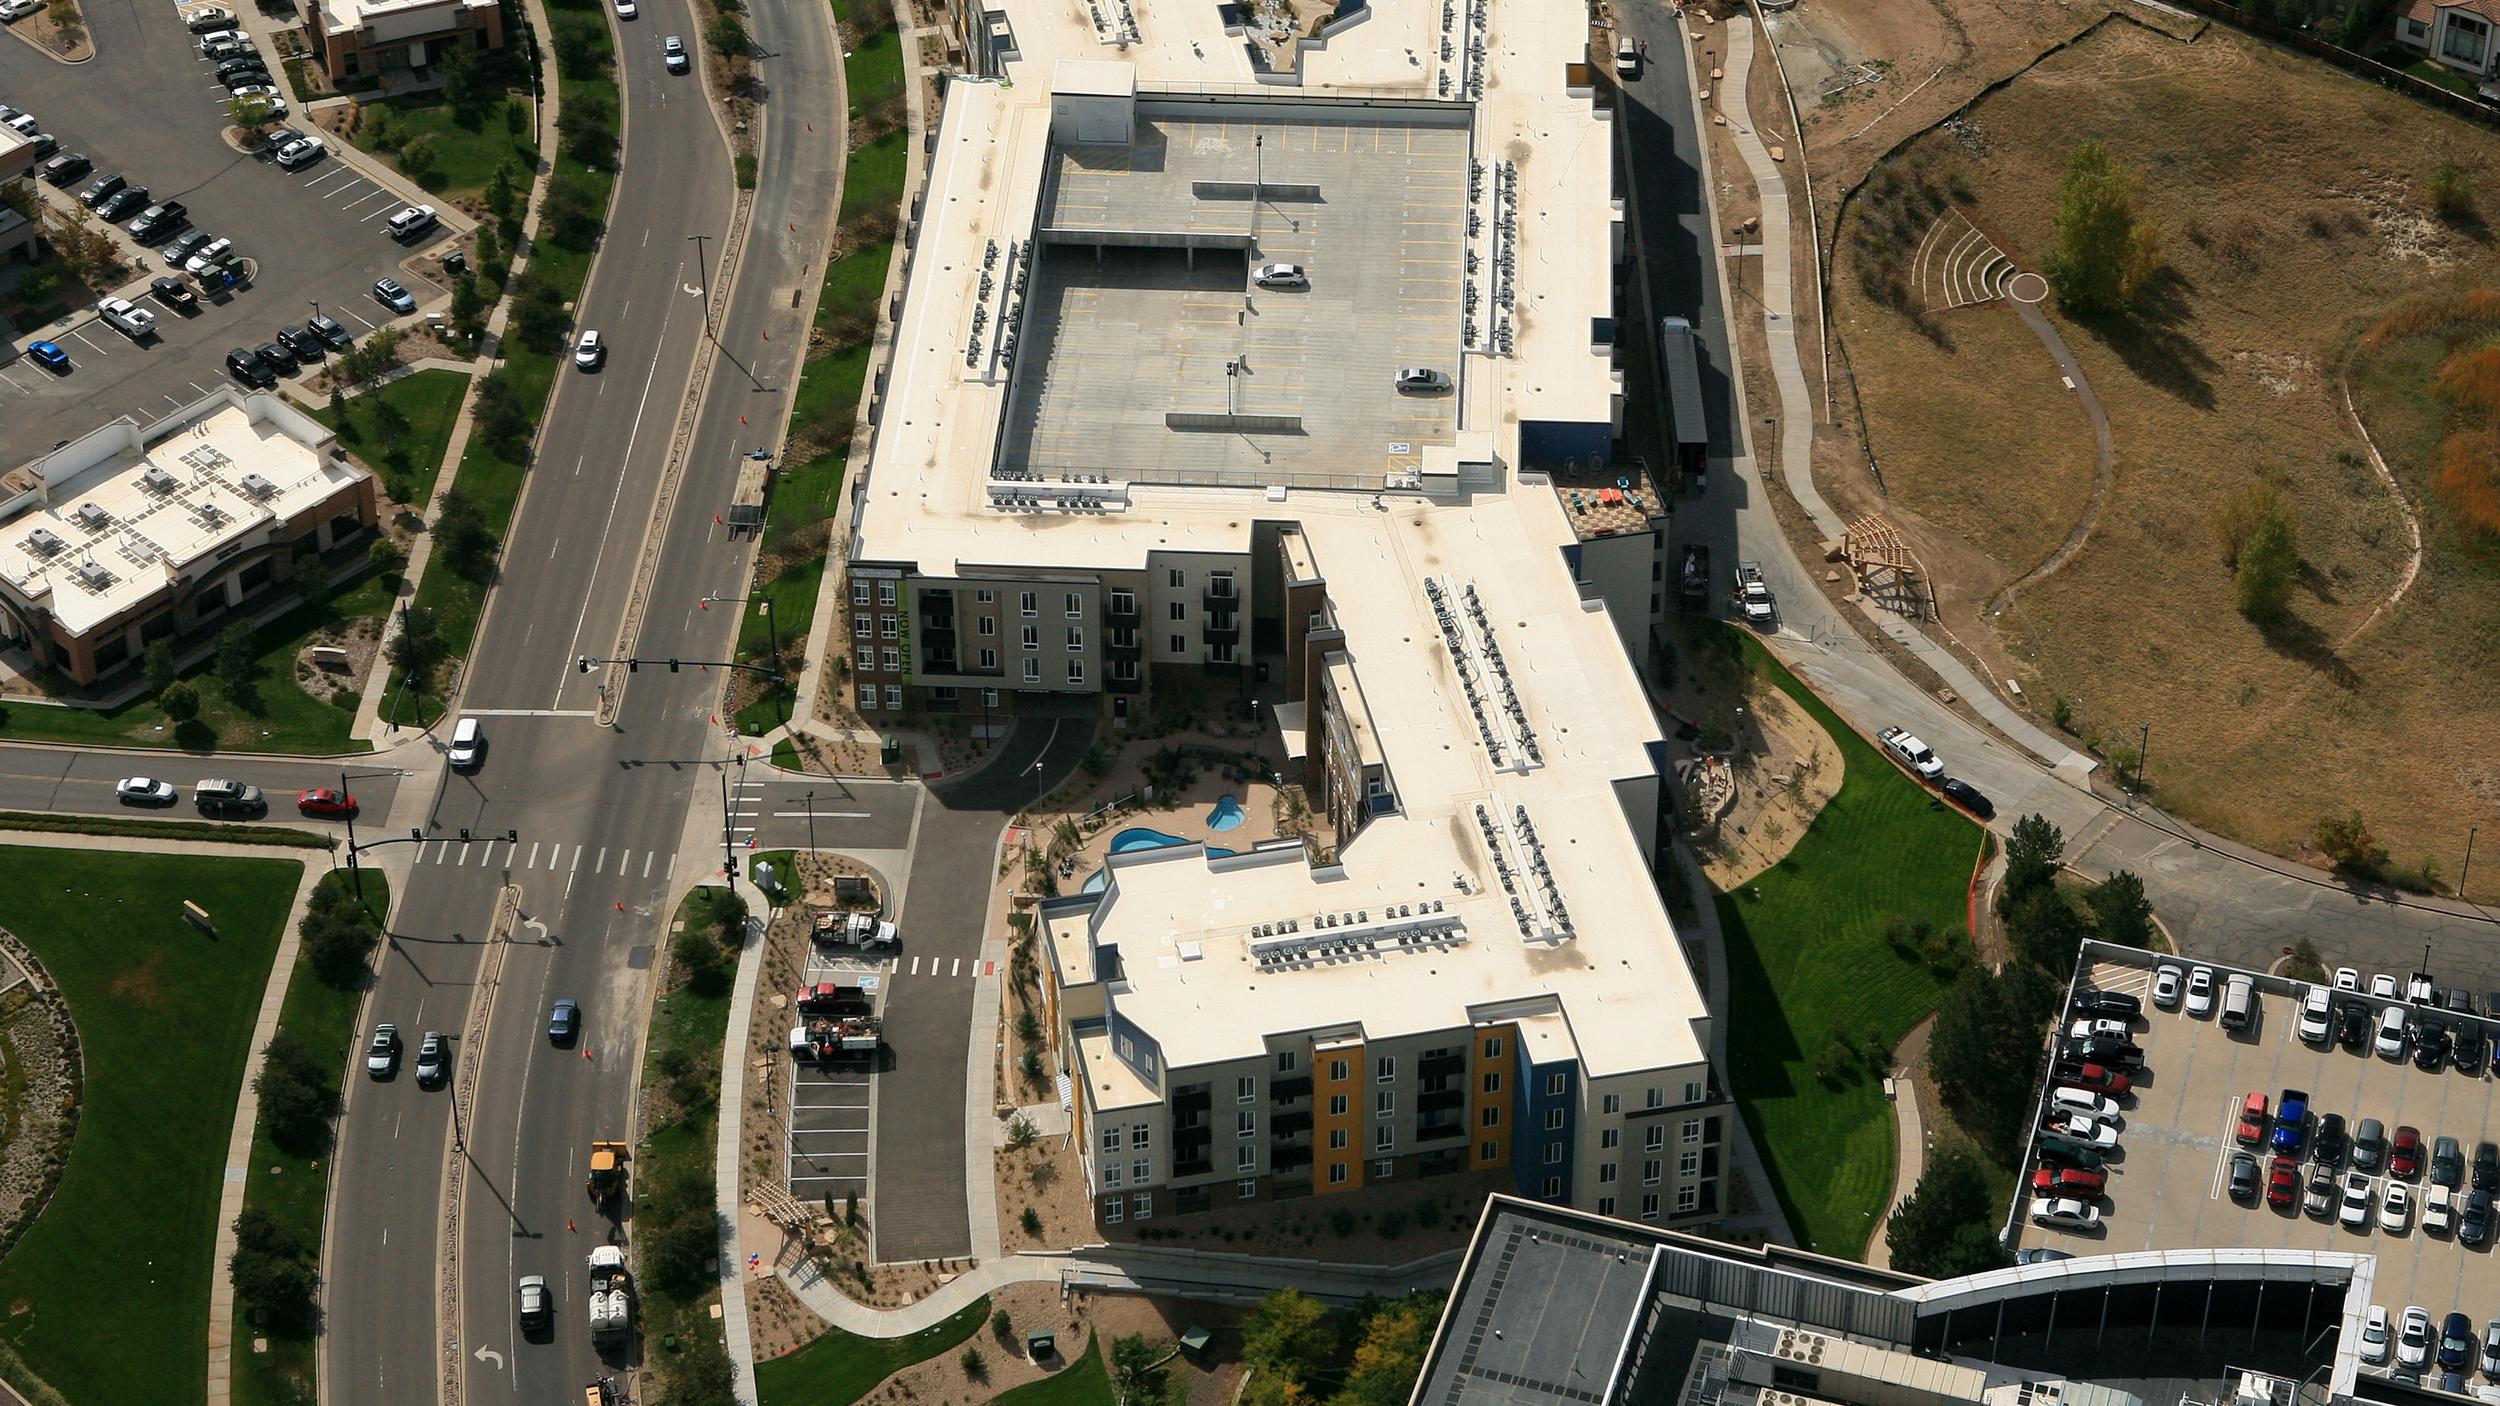 Lincoln Station_Aerial_9-28-15_2315_04.jpg